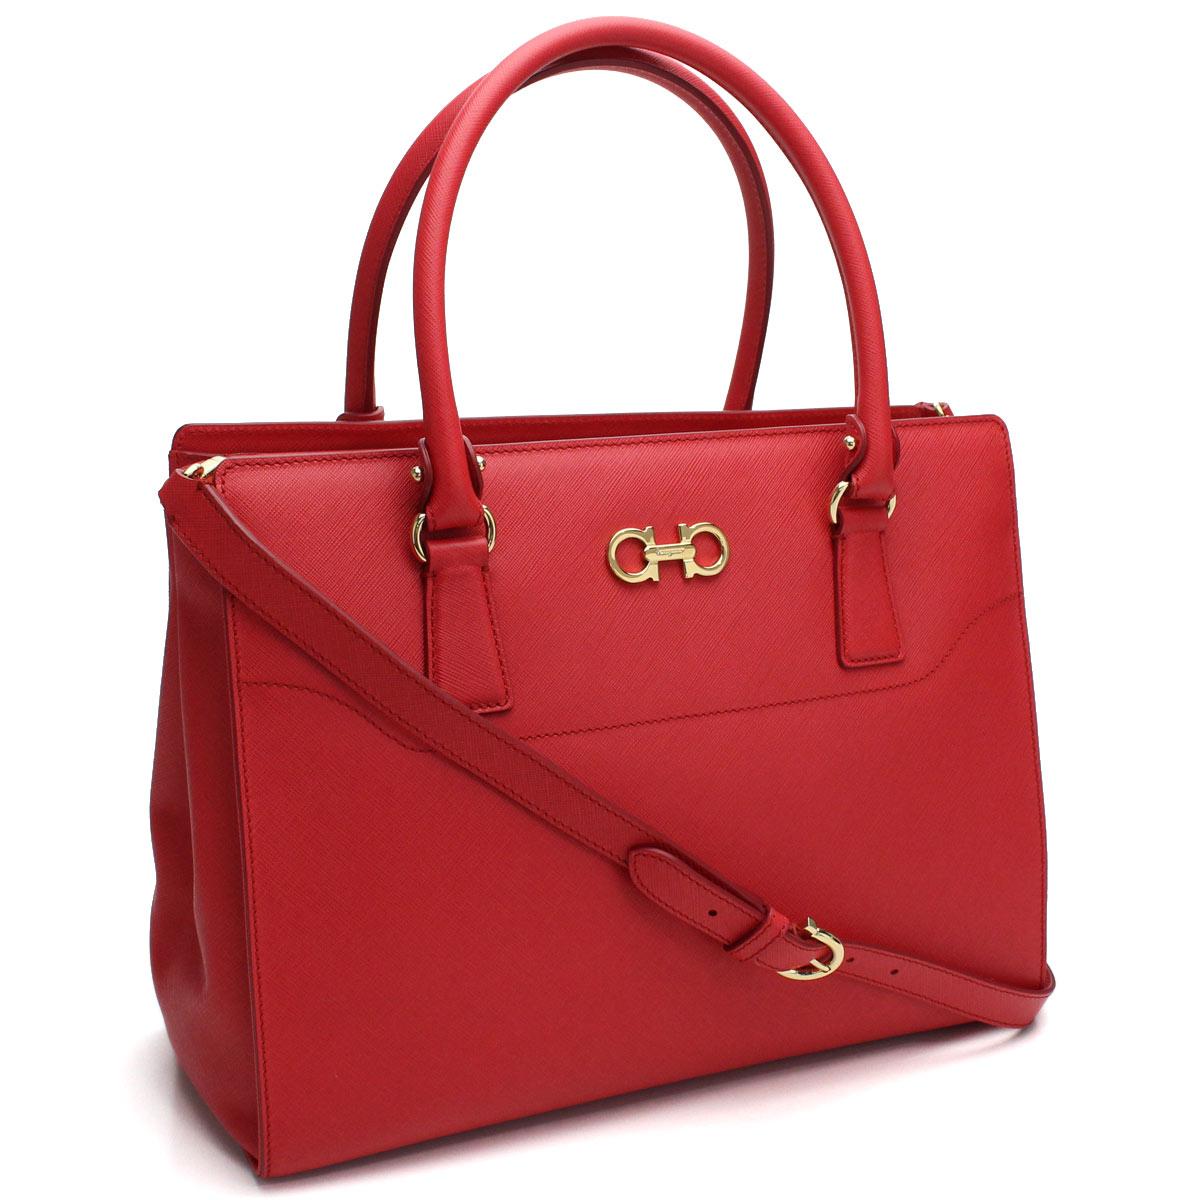 Bighit The total brand wholesale  Ferragamo (FERRAGAMO) BEKY handbag  21-F271 0655818 PAMPLONA  a8c09a8dfe3b2